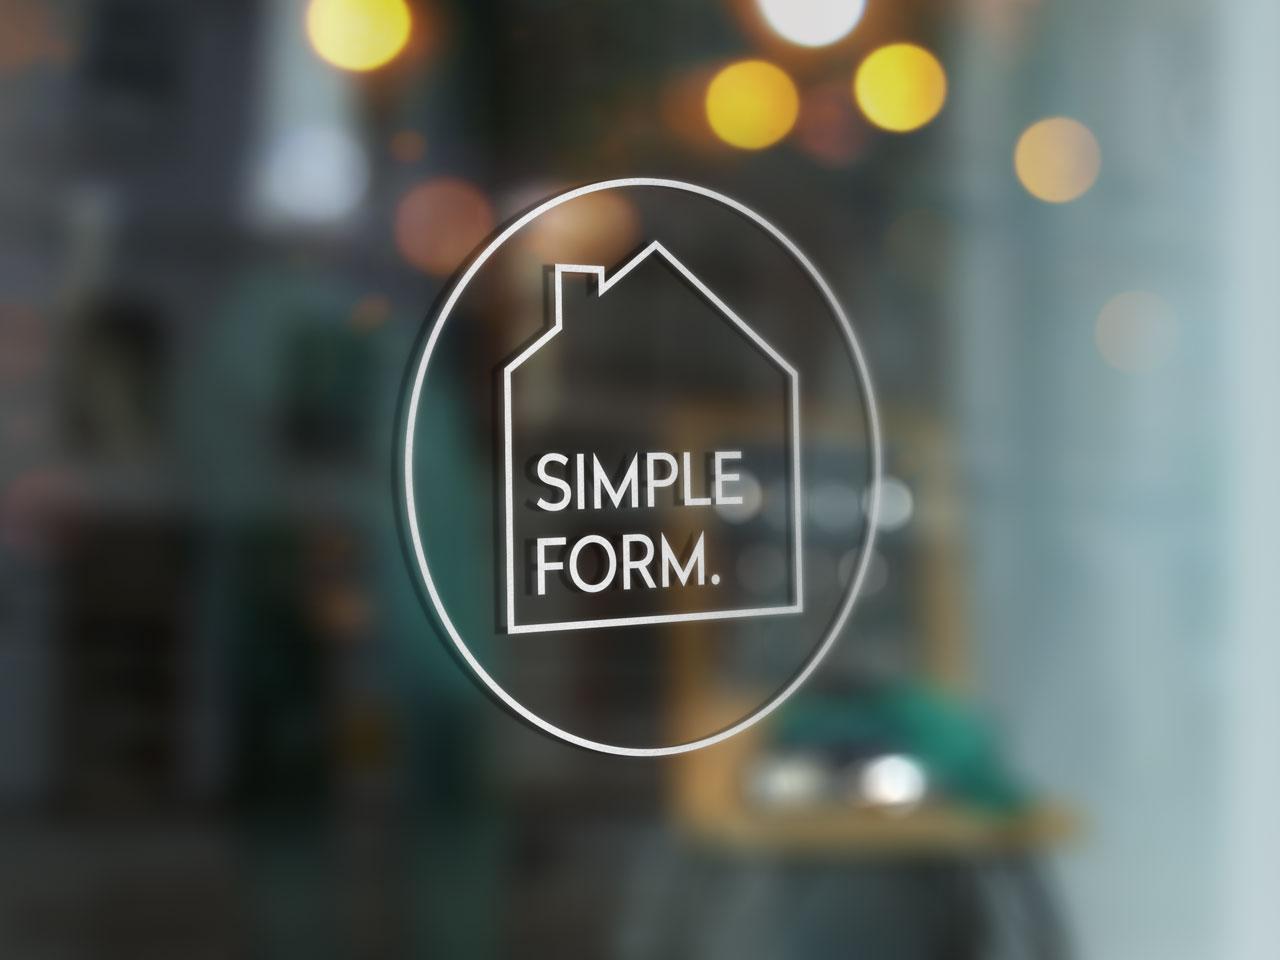 SIMPLE FORM - Minimalist Scandinavian Inspired Homewares Shop